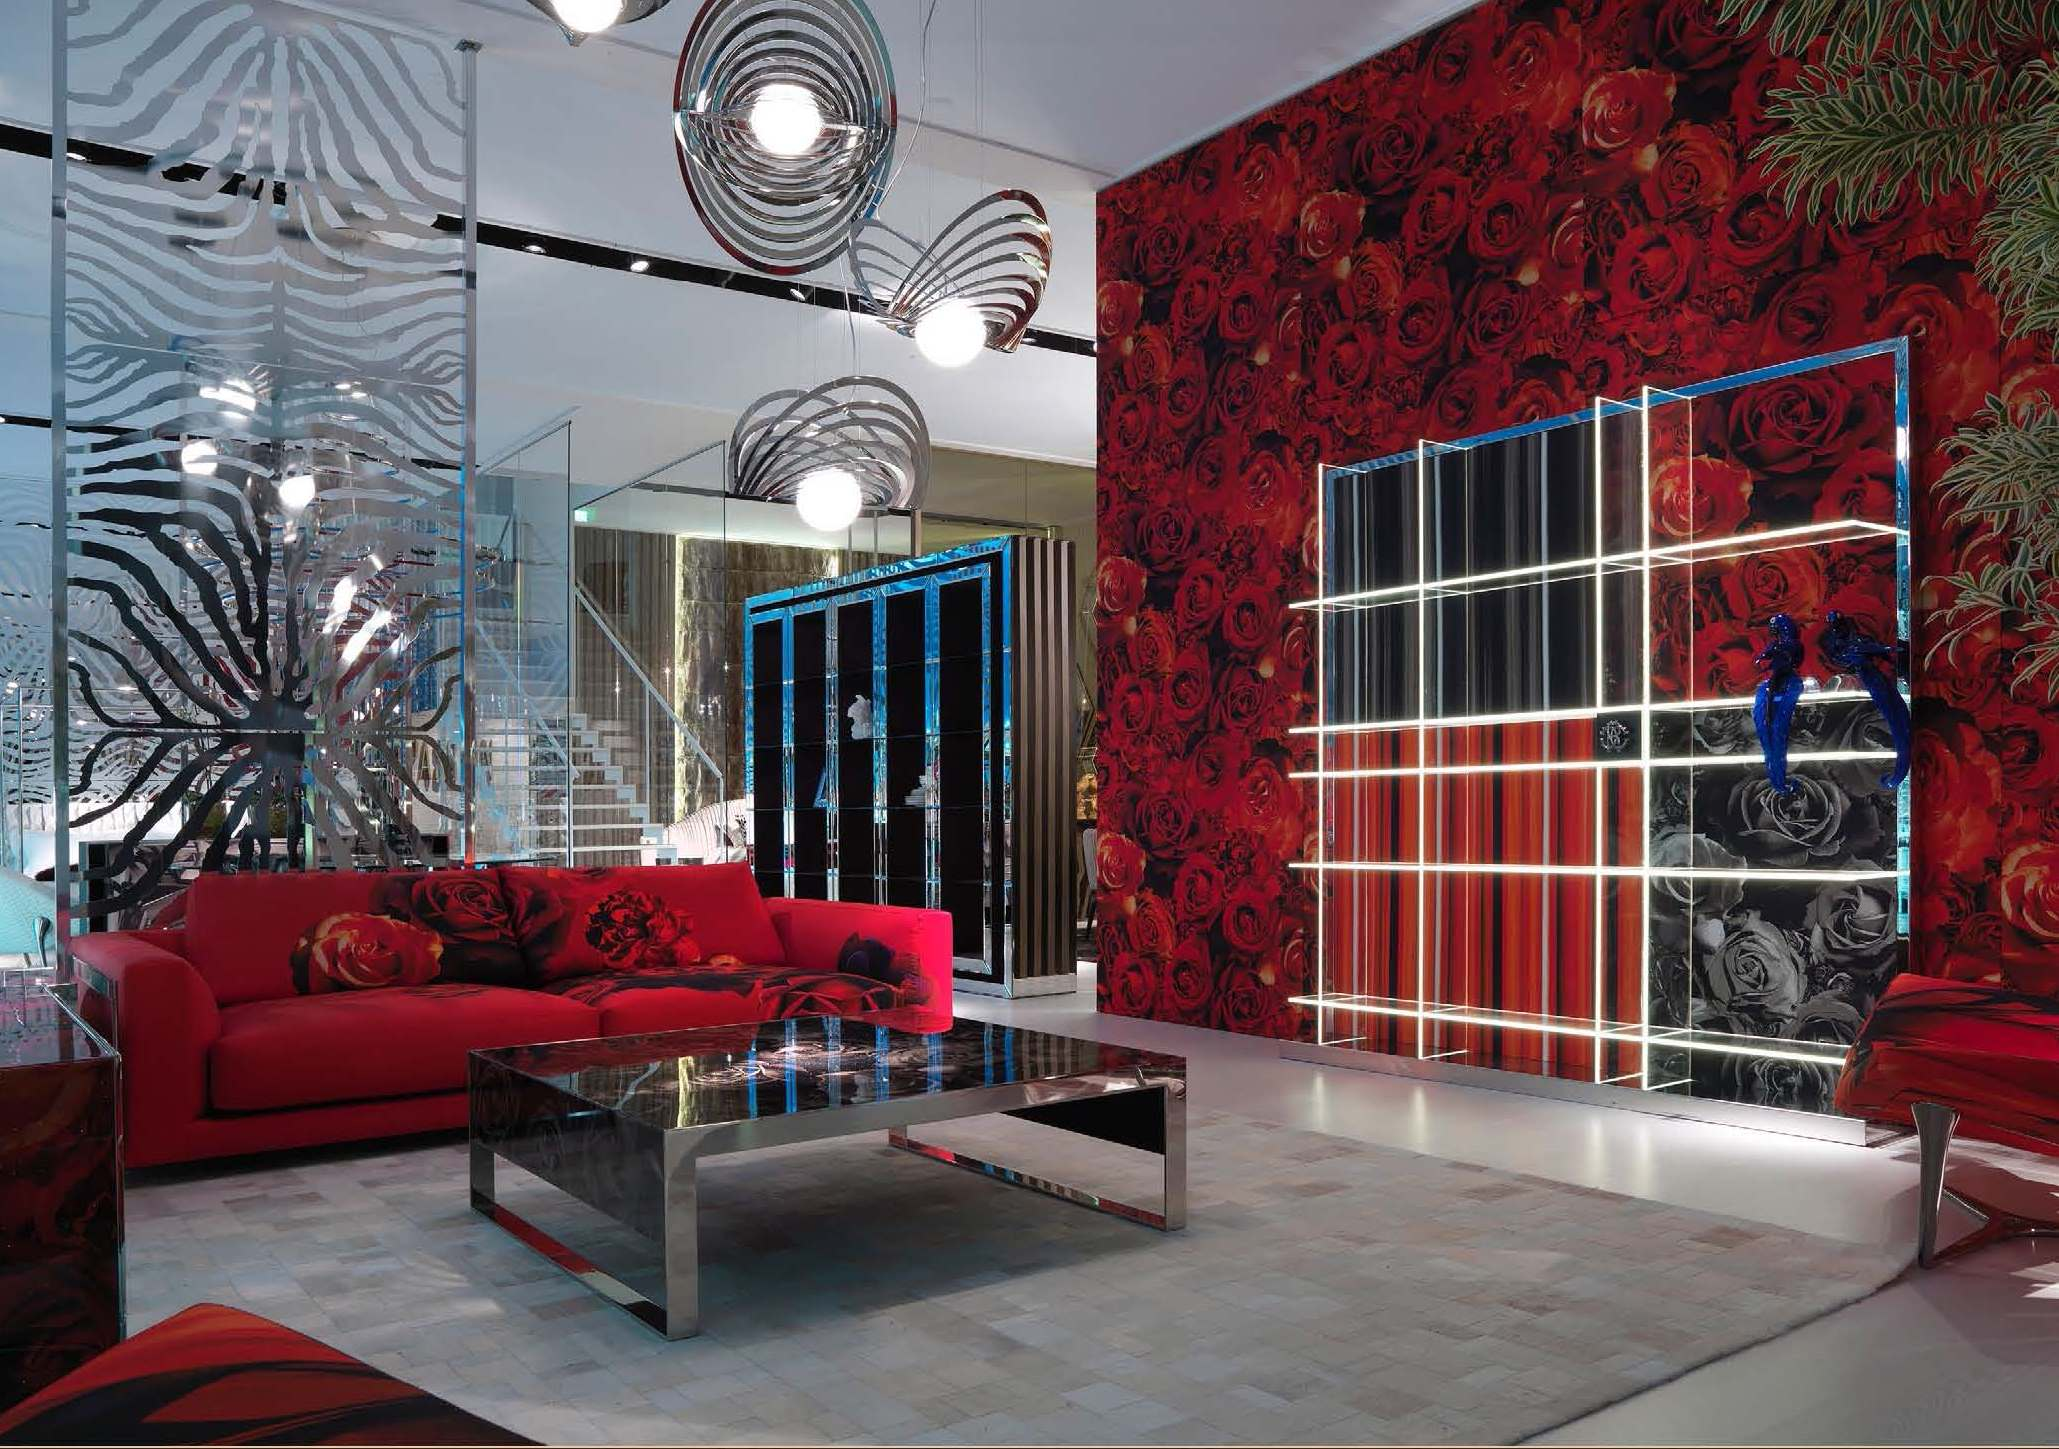 Roberto_Cavalli_Home_Interiors_Milan_Fair_2014_Page_12